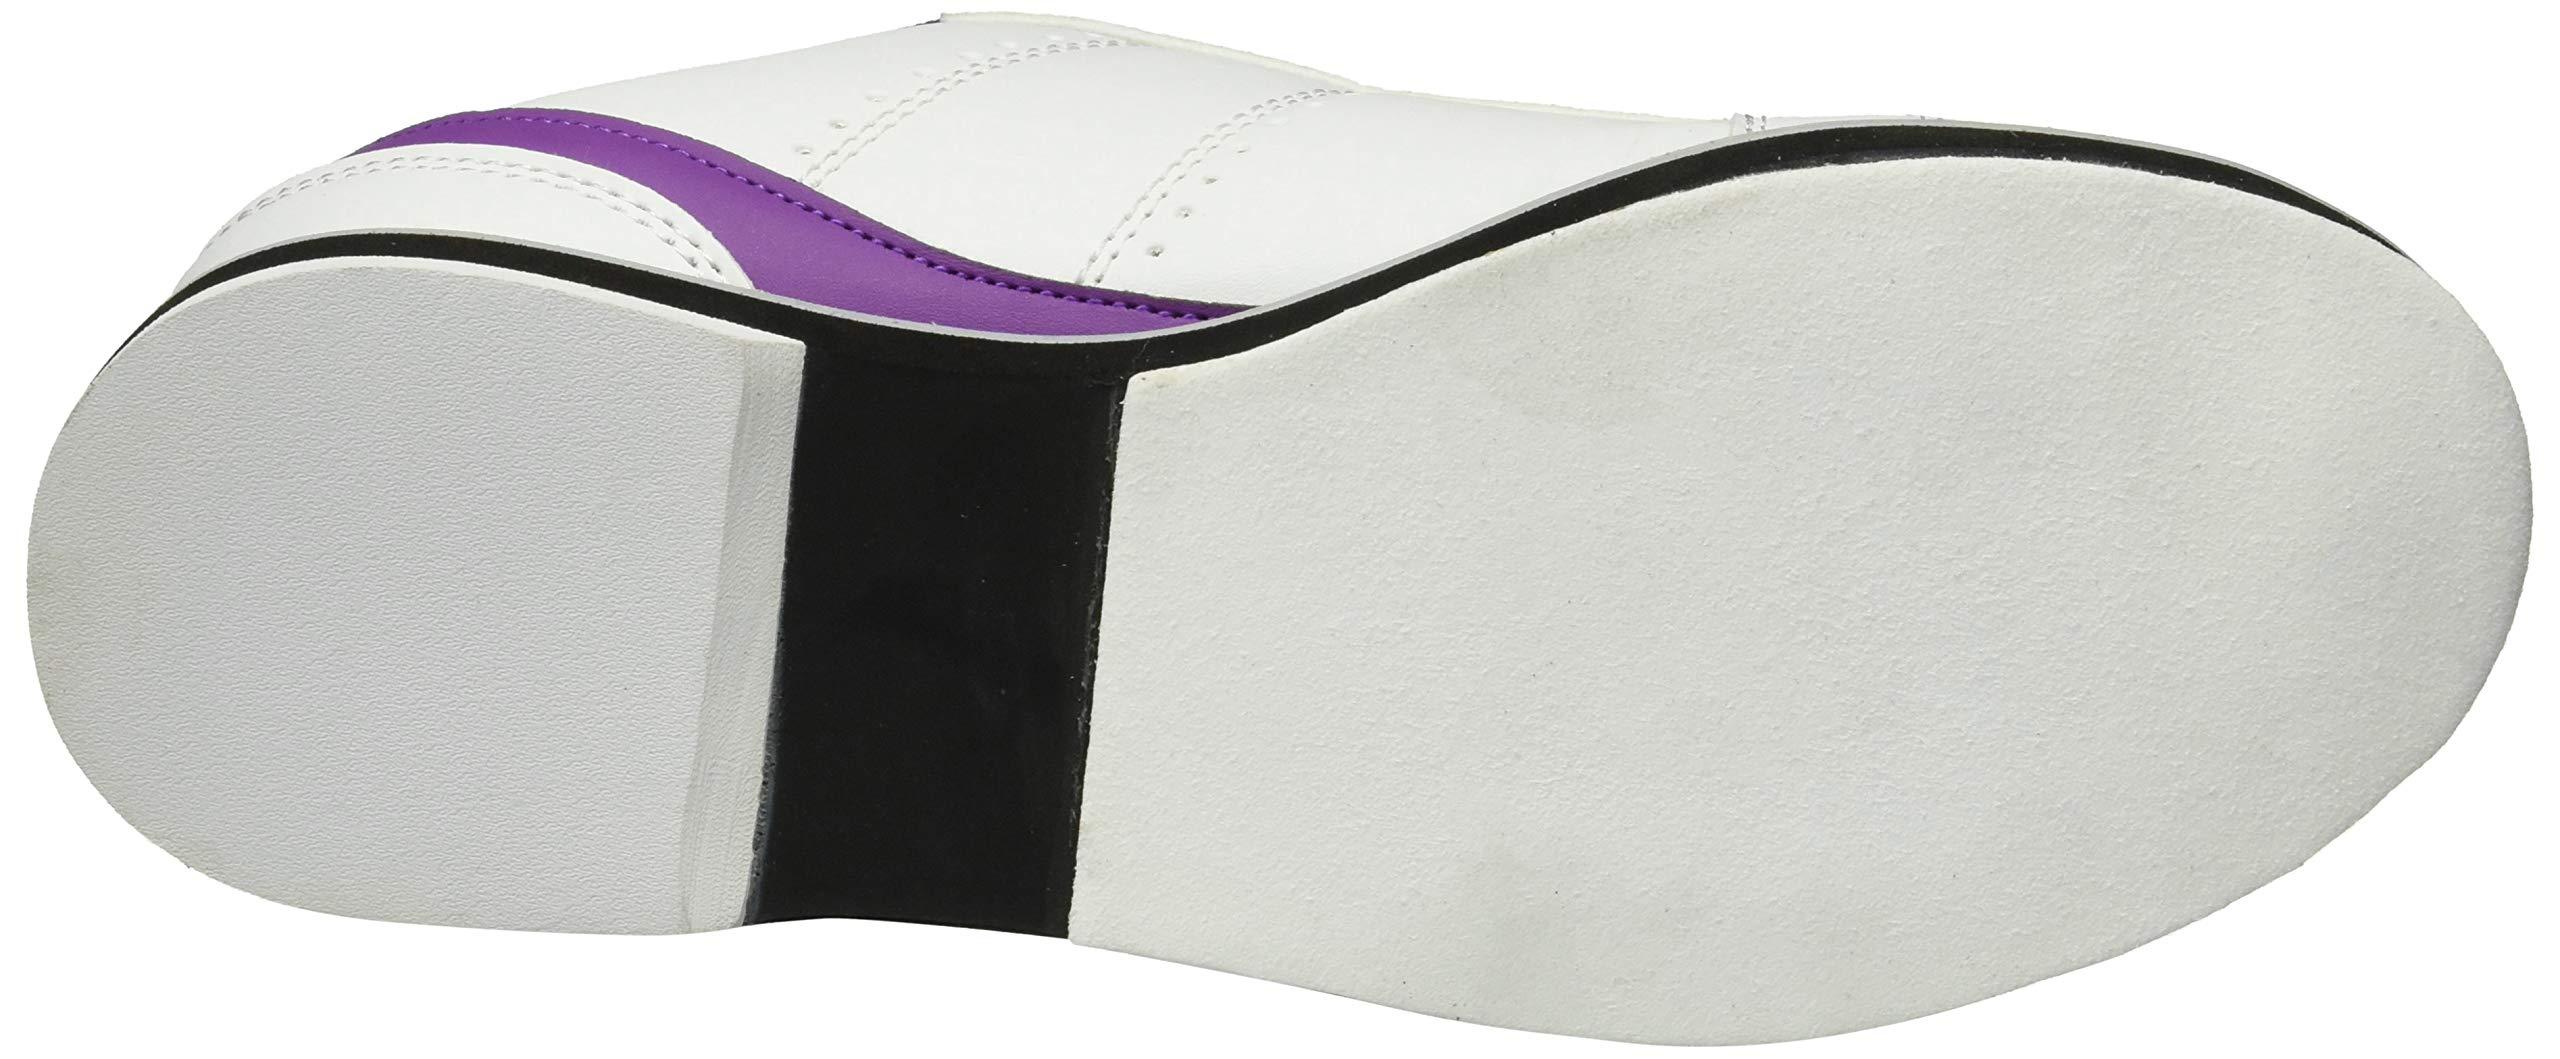 BSI Women's 460 Bowling Shoe, White/Purple, Size 7 by BSI (Image #3)